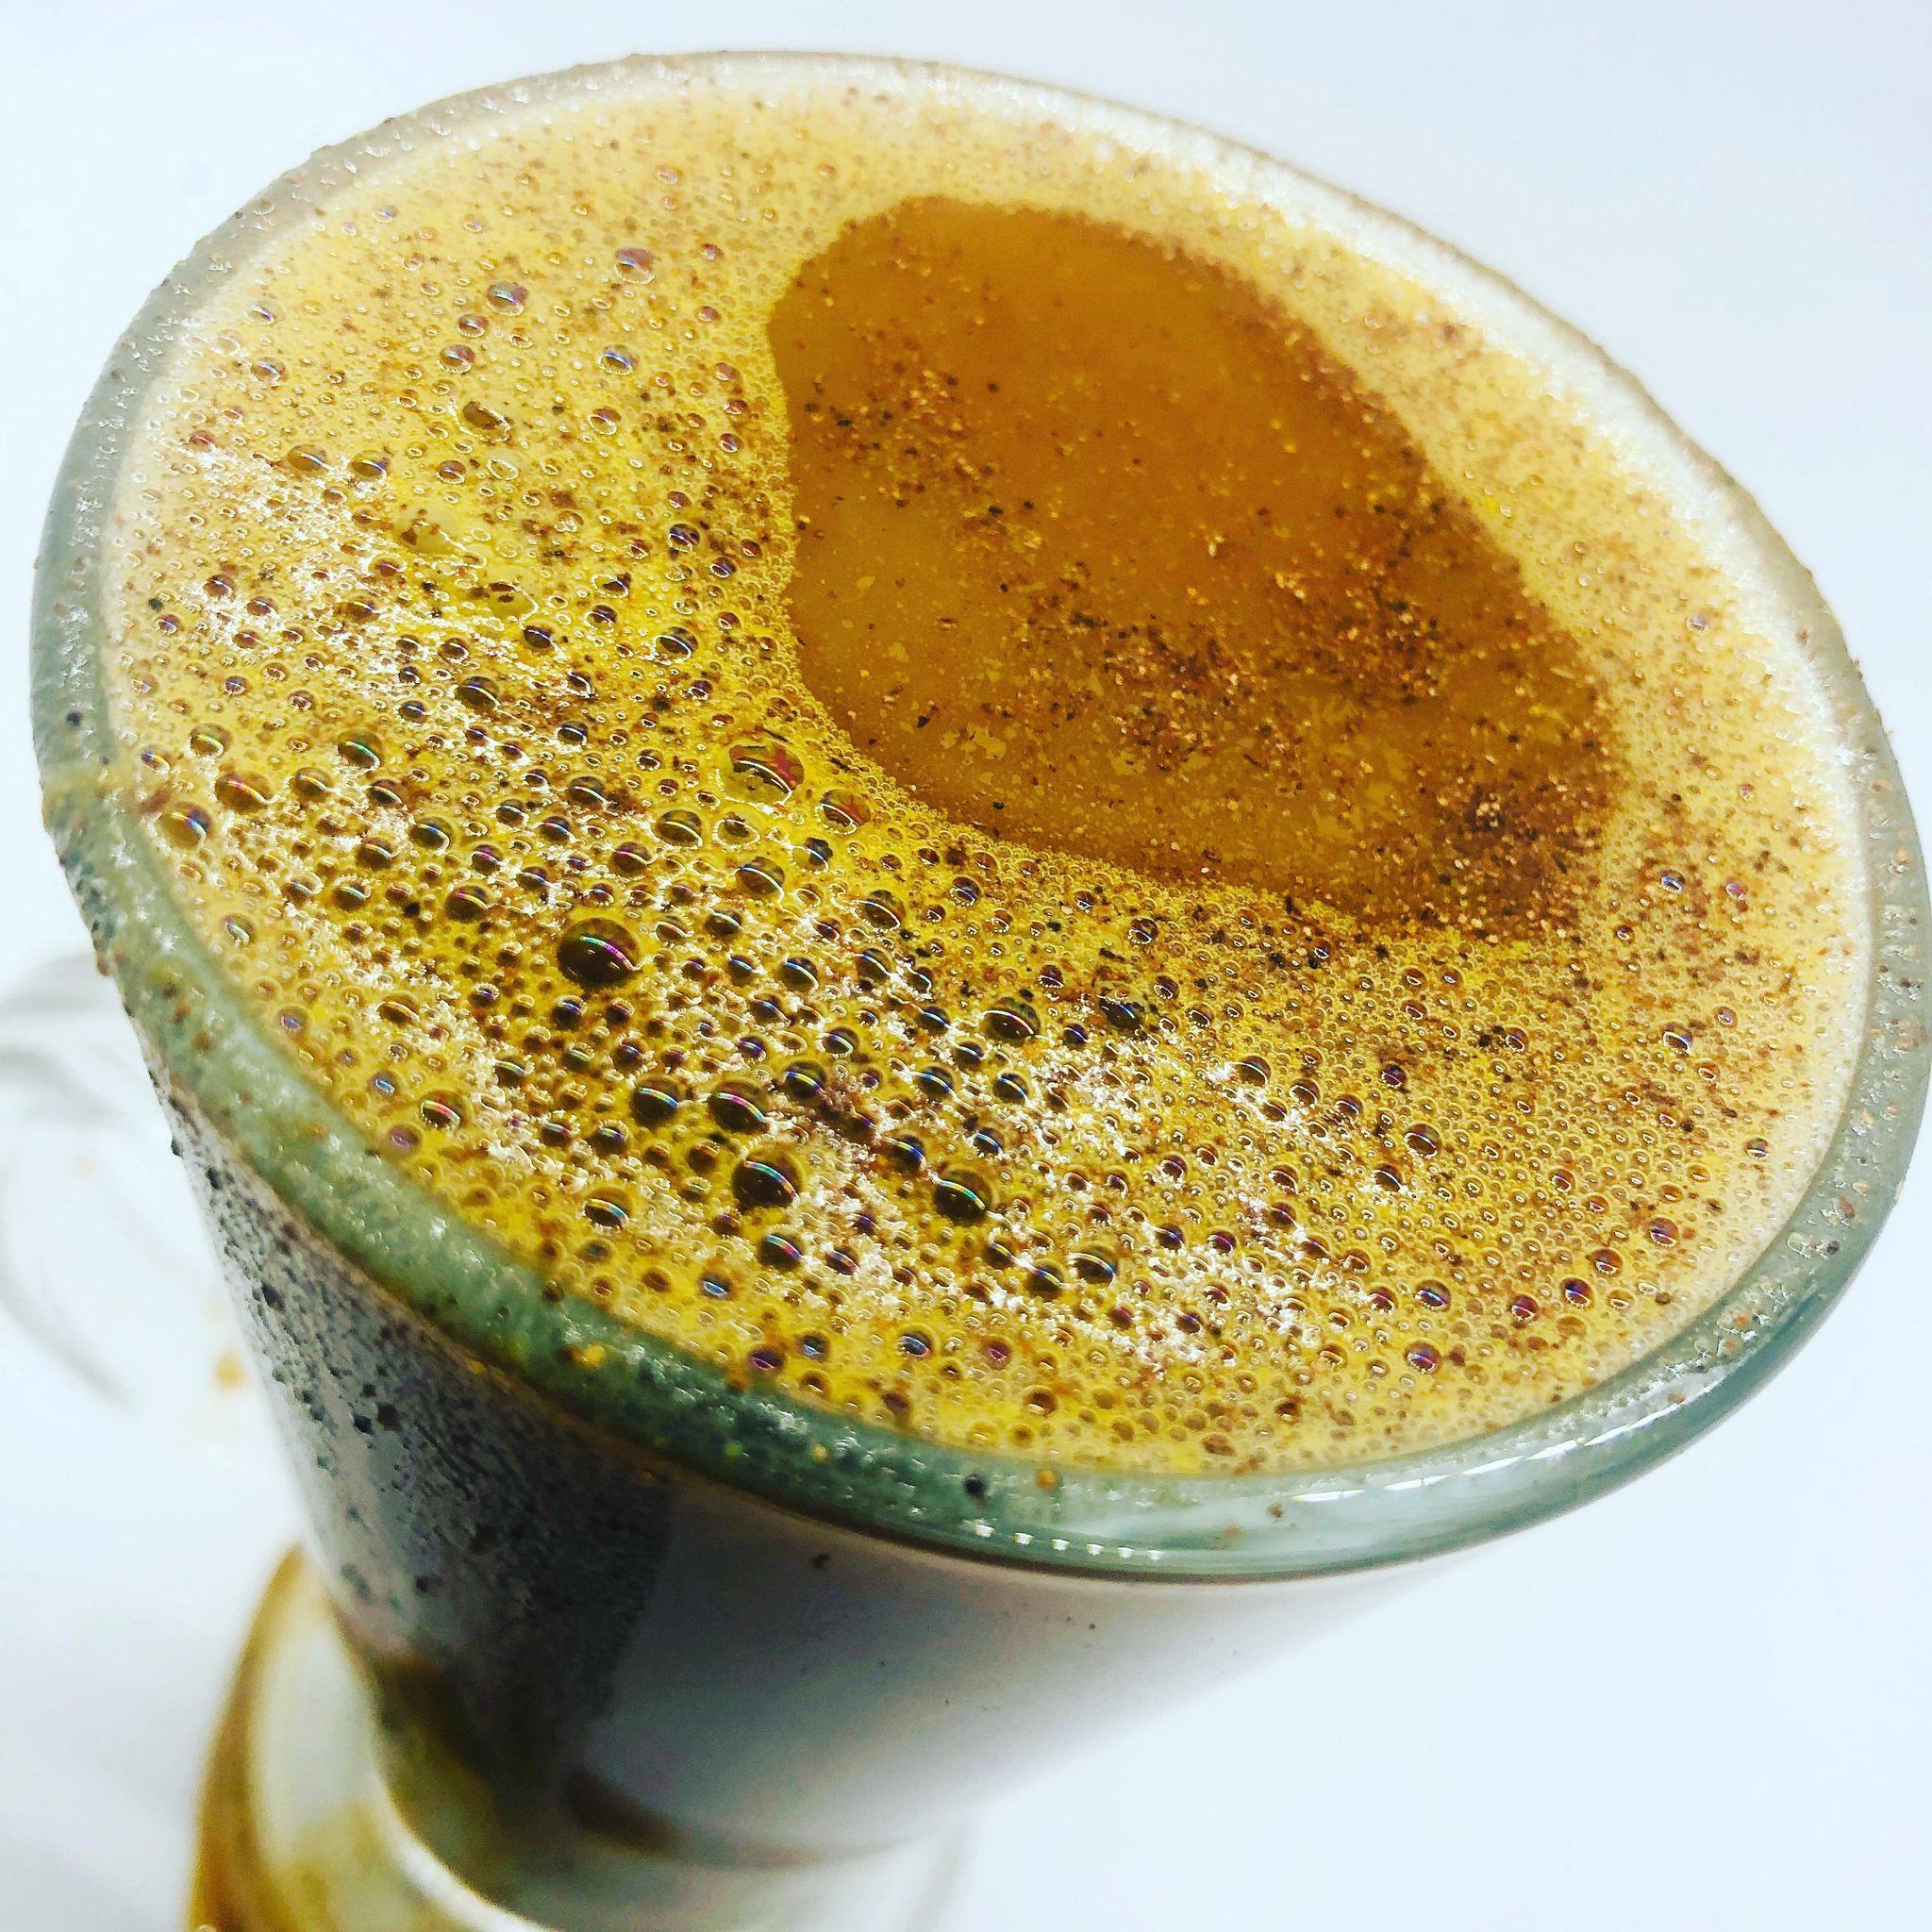 5-Minute Warm Vegan Pumpkin Spiced Latte